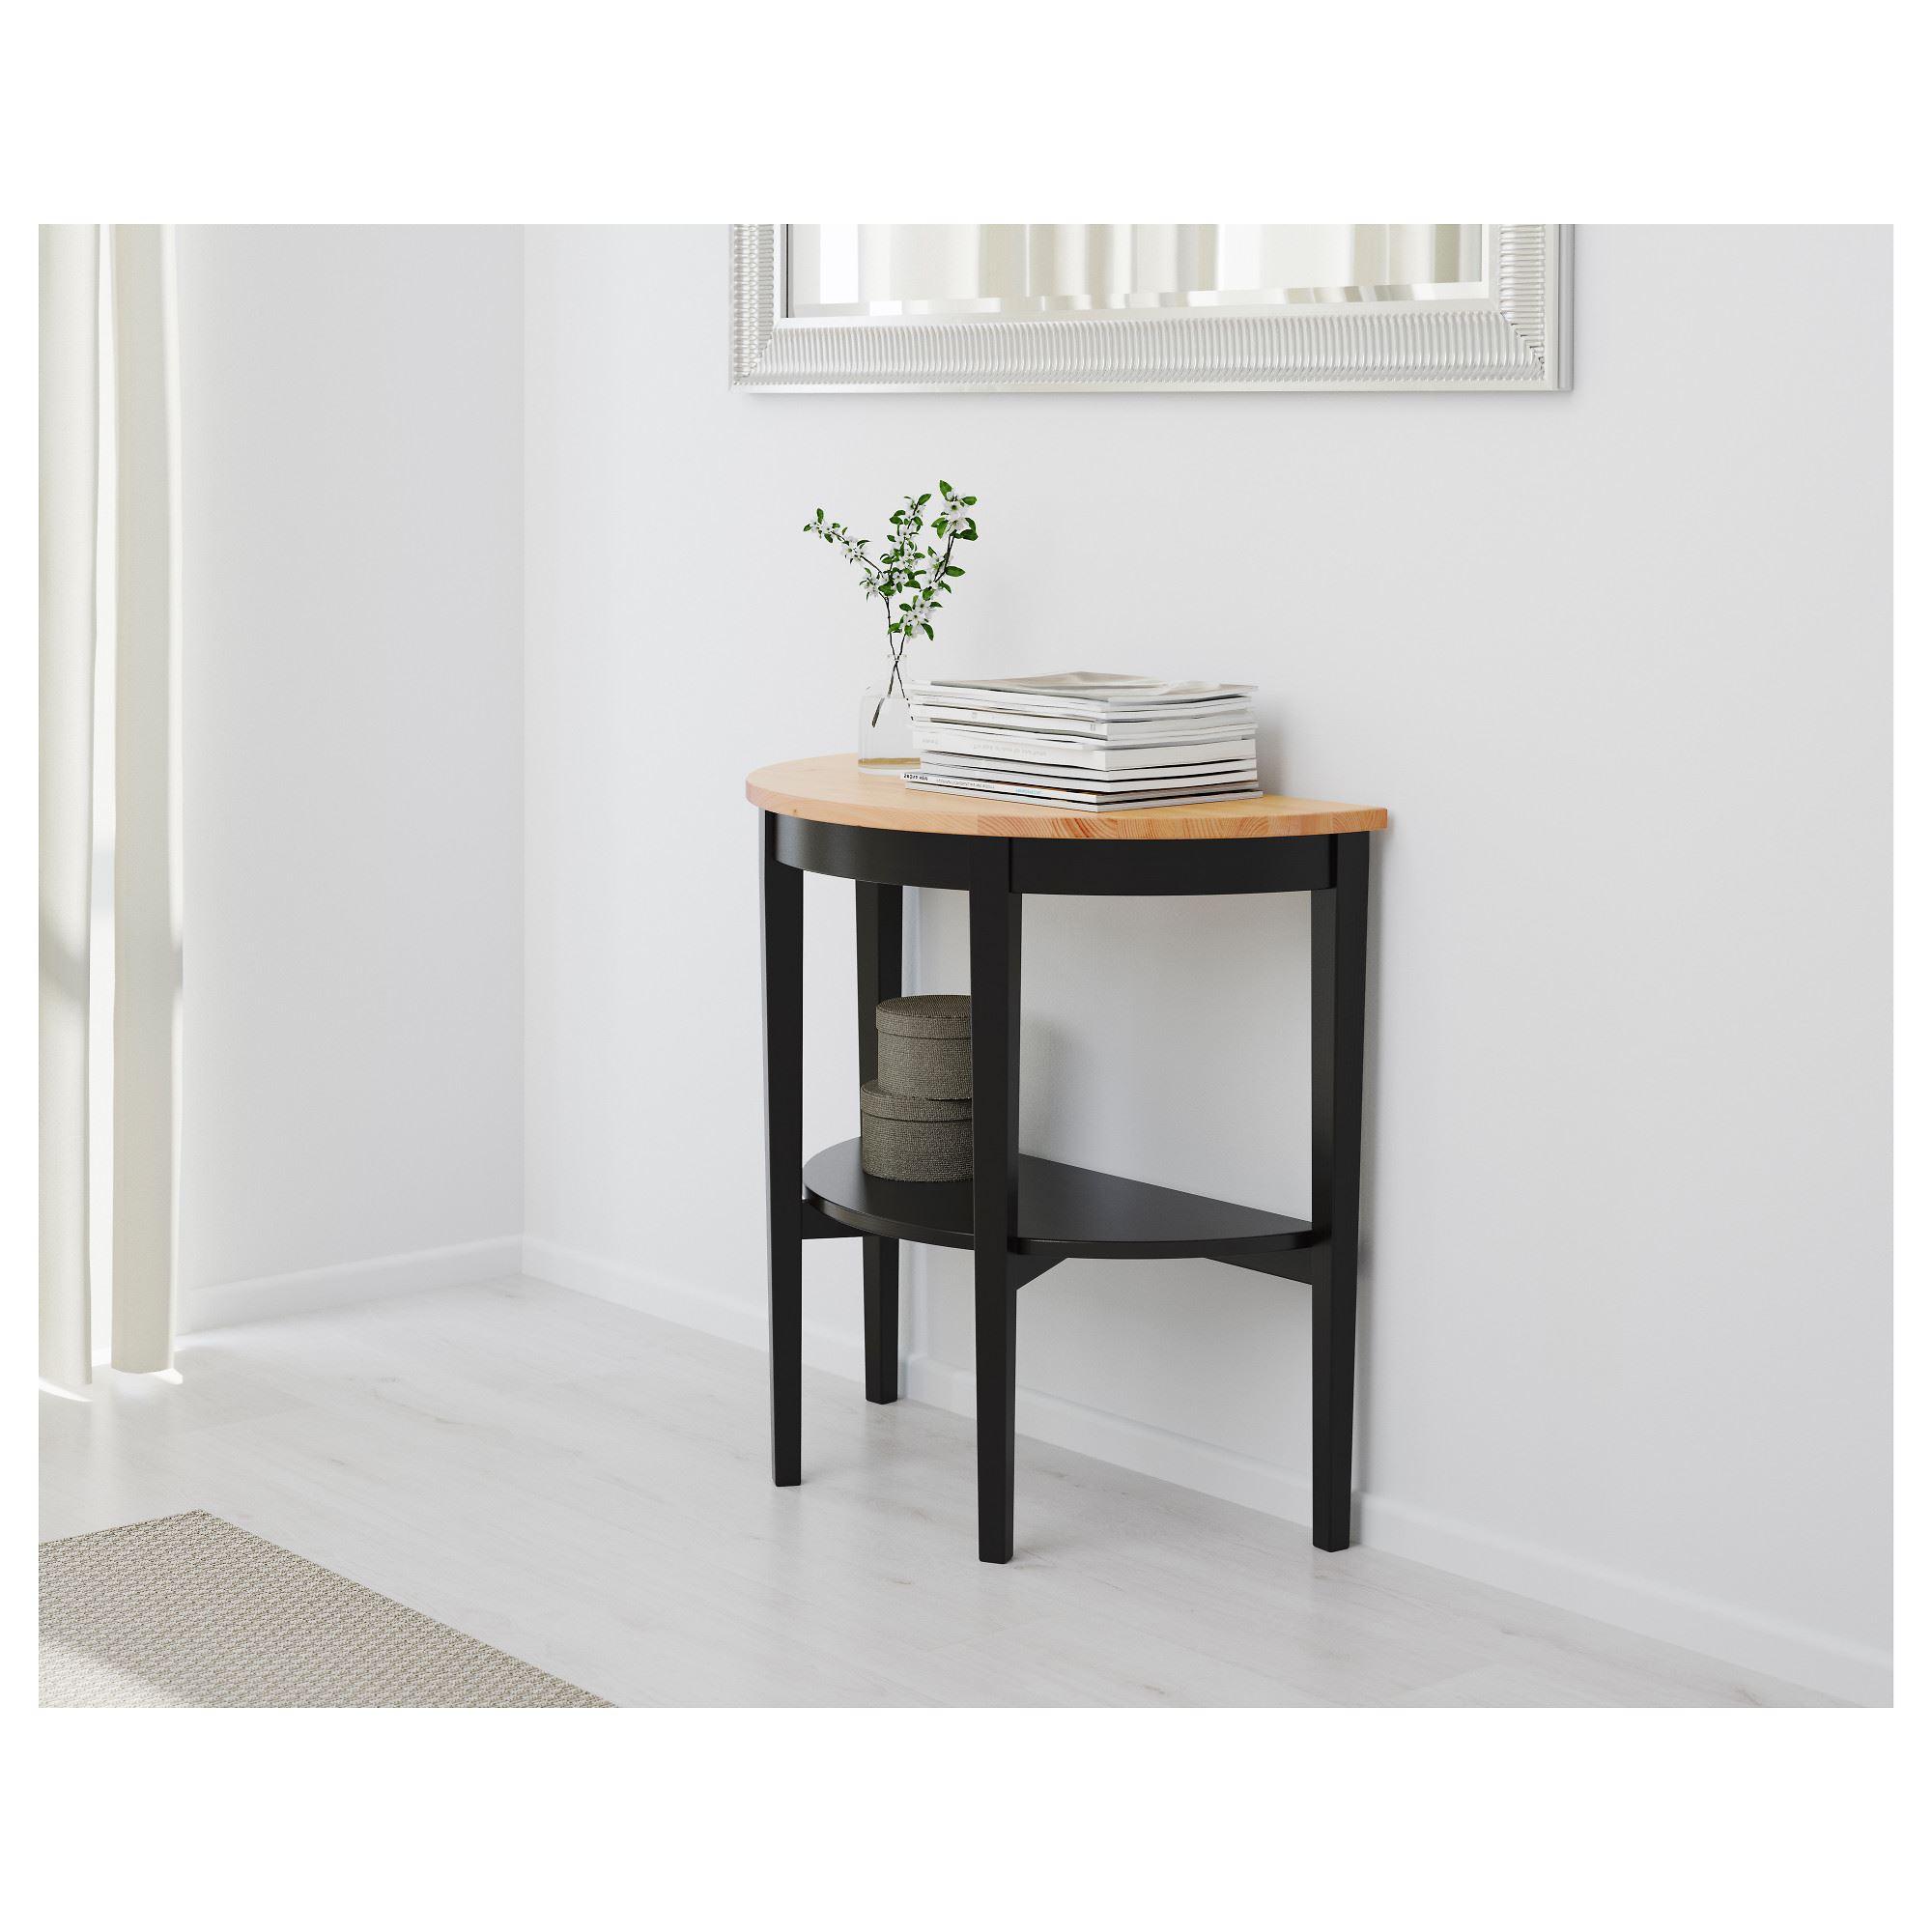 Arkelstorp Yan Sehpa Siyah 80x40x75 Cm Ikea Oturma Odalari